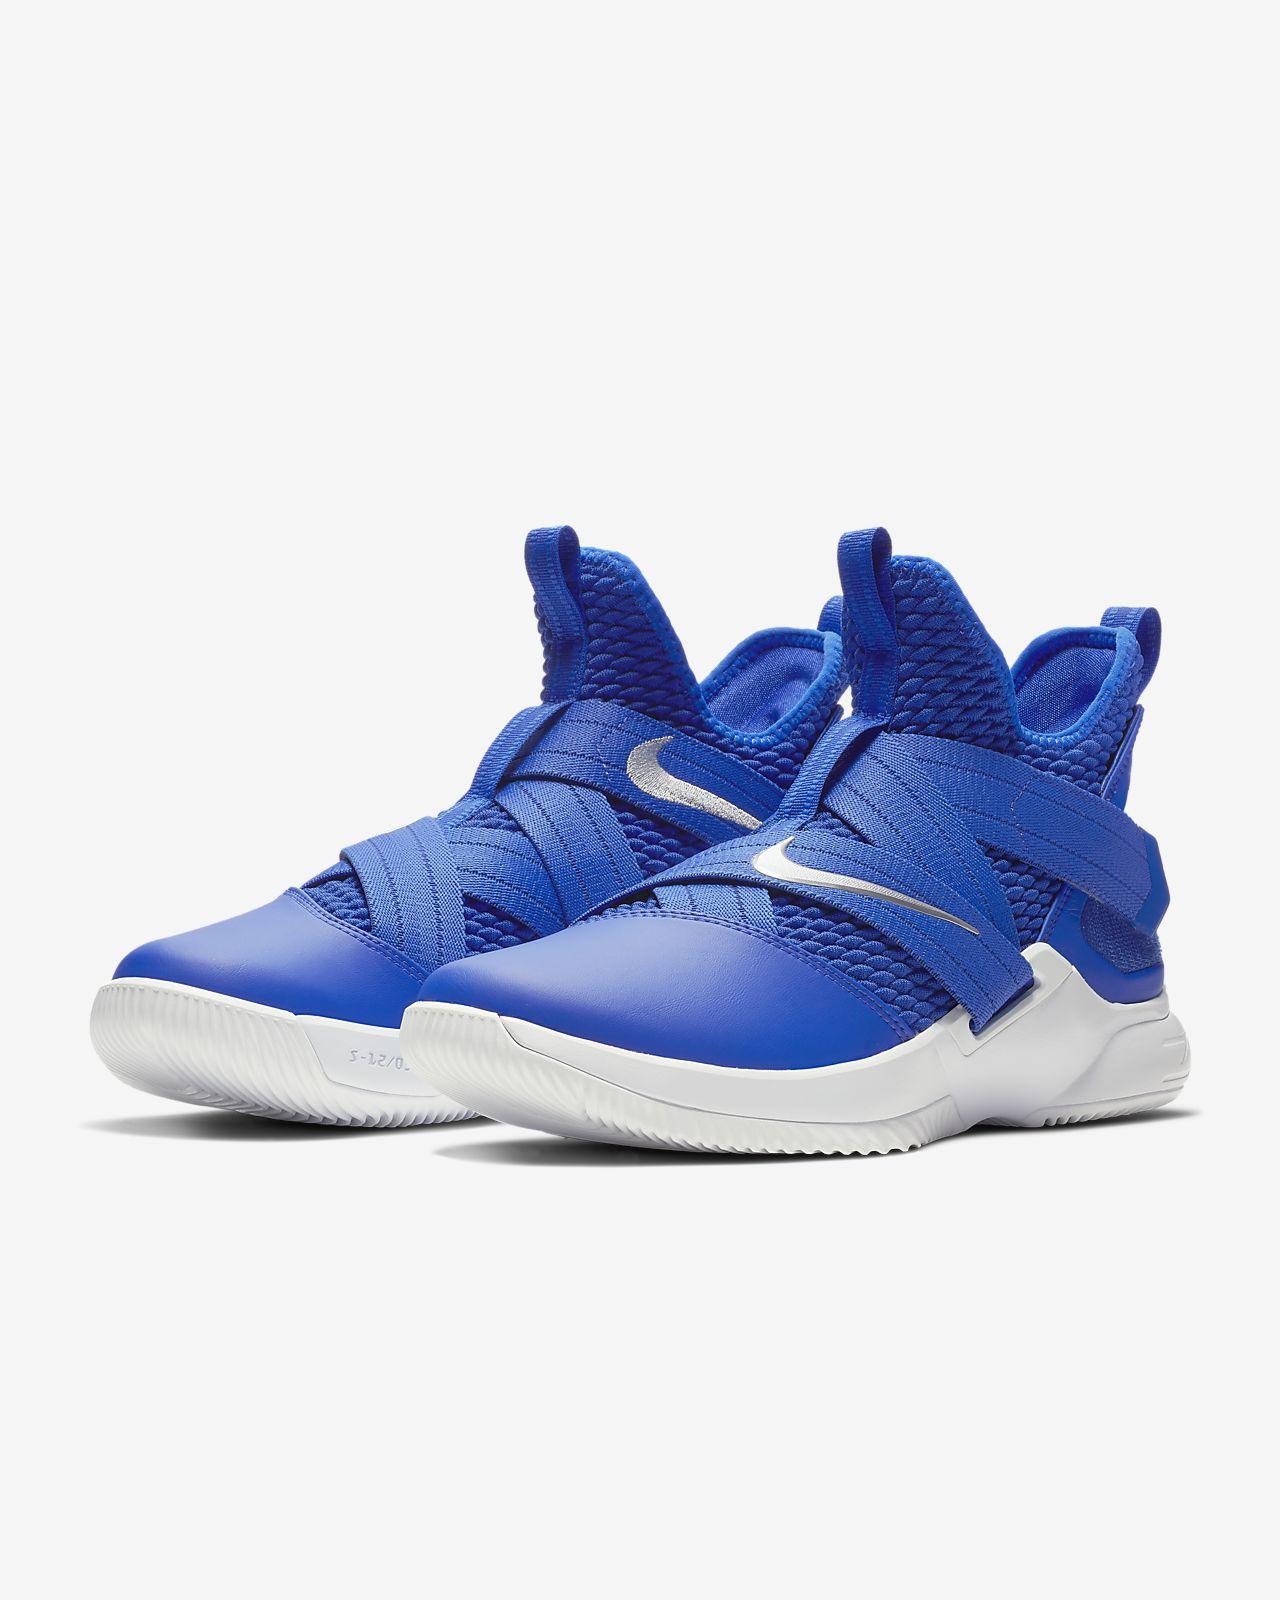 656a92024426dc LeBron Soldier 12 (Team) Men s Basketball Shoe. Nike.com